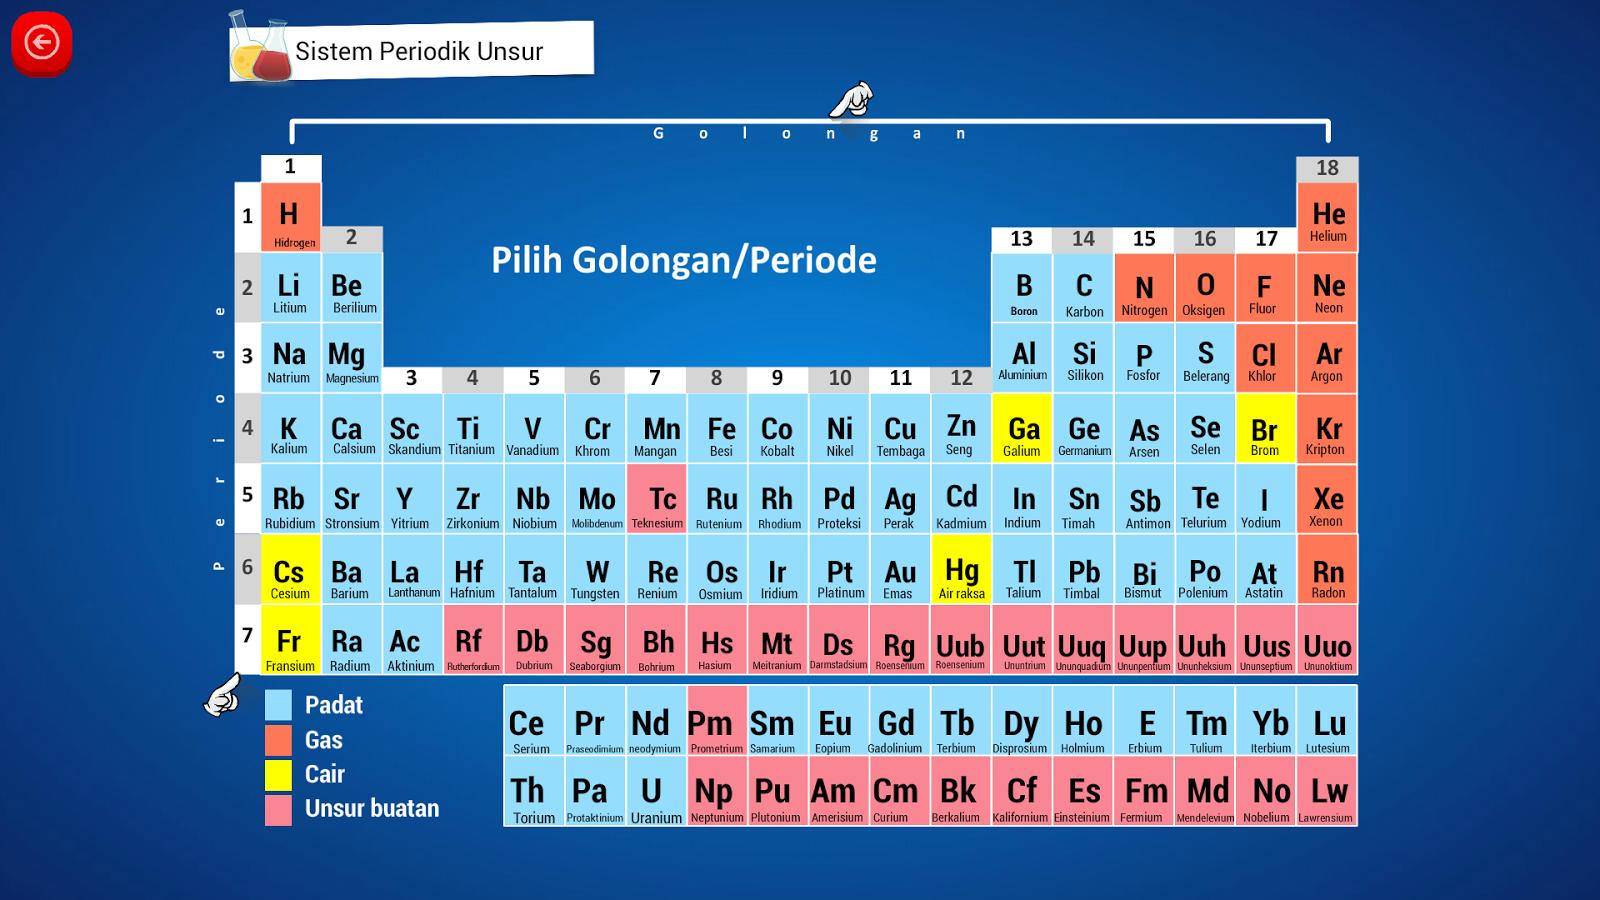 Kimia sma sistem periodik unsur android apps p google play kimia sma sistem periodik unsur screenshot urtaz Image collections